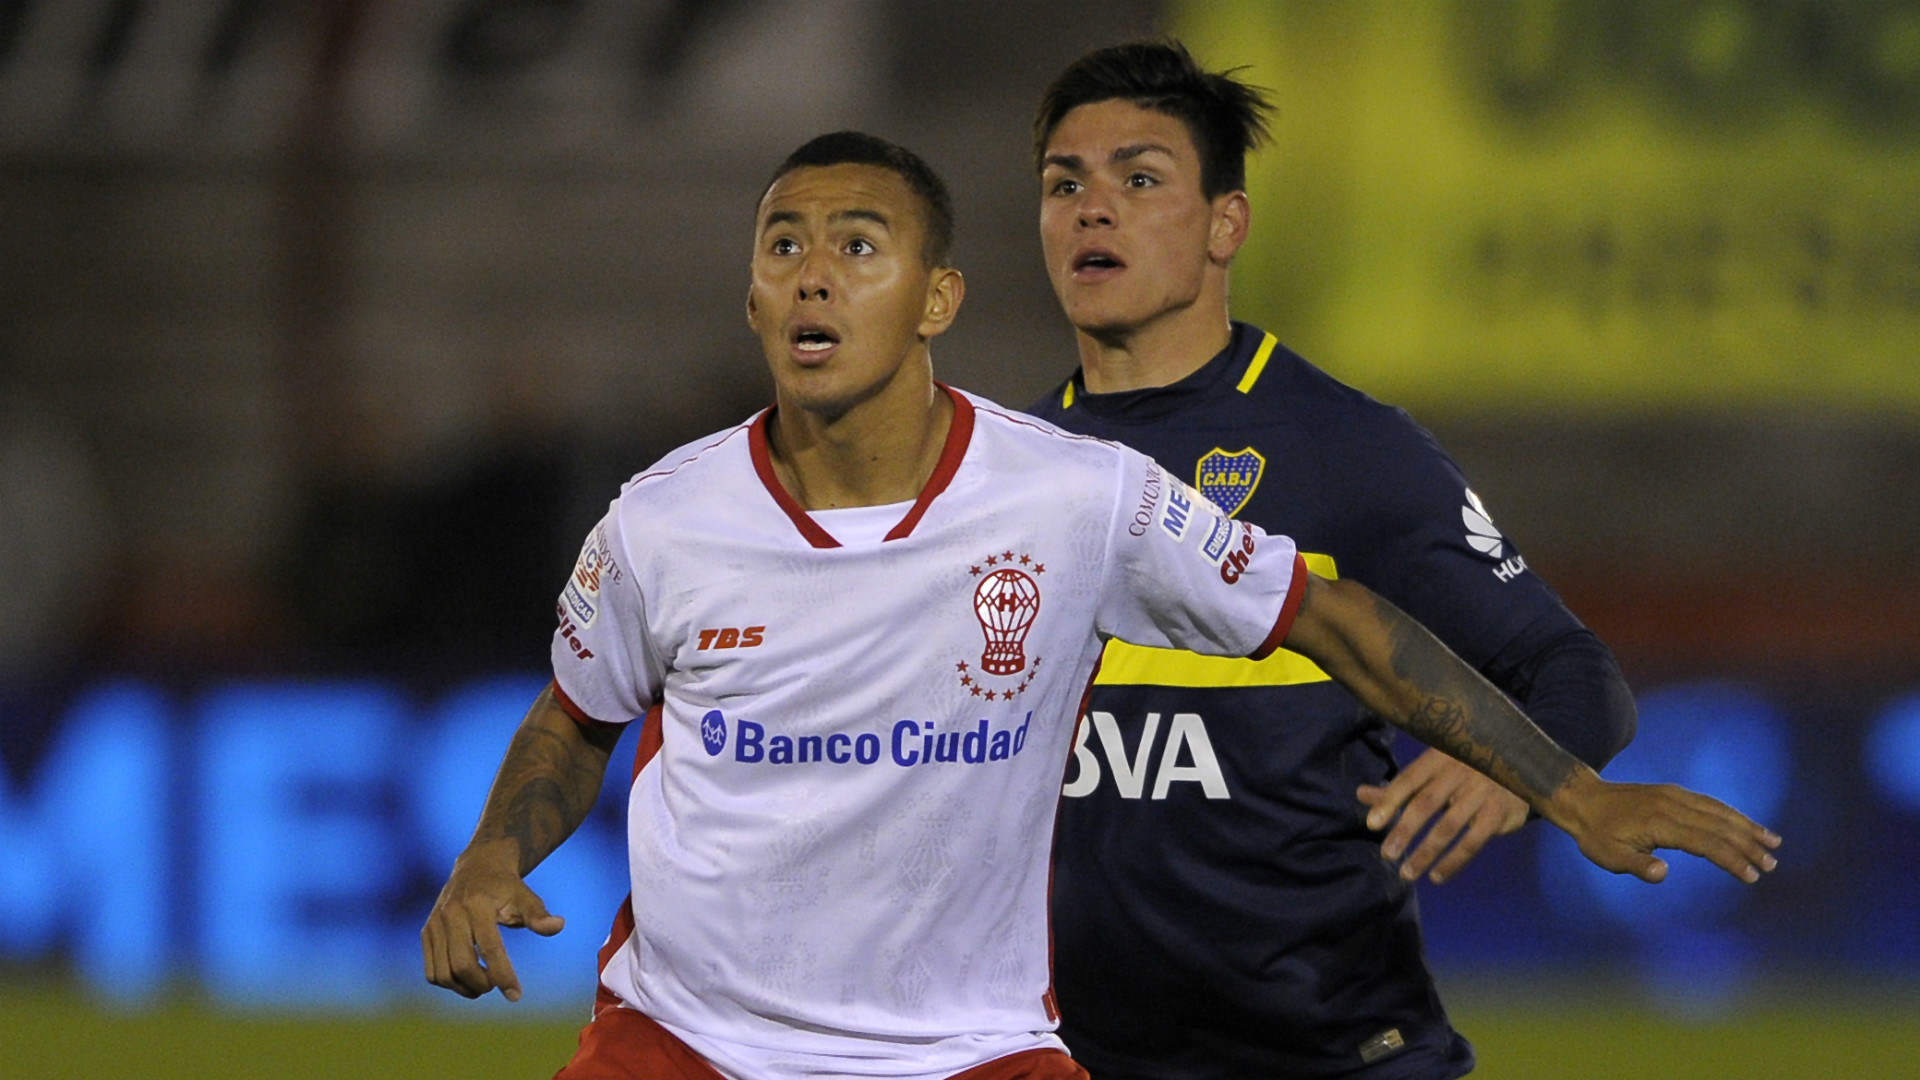 Jonathan Silva Boca Huracan Fecha 26 Campeonto Primera Division